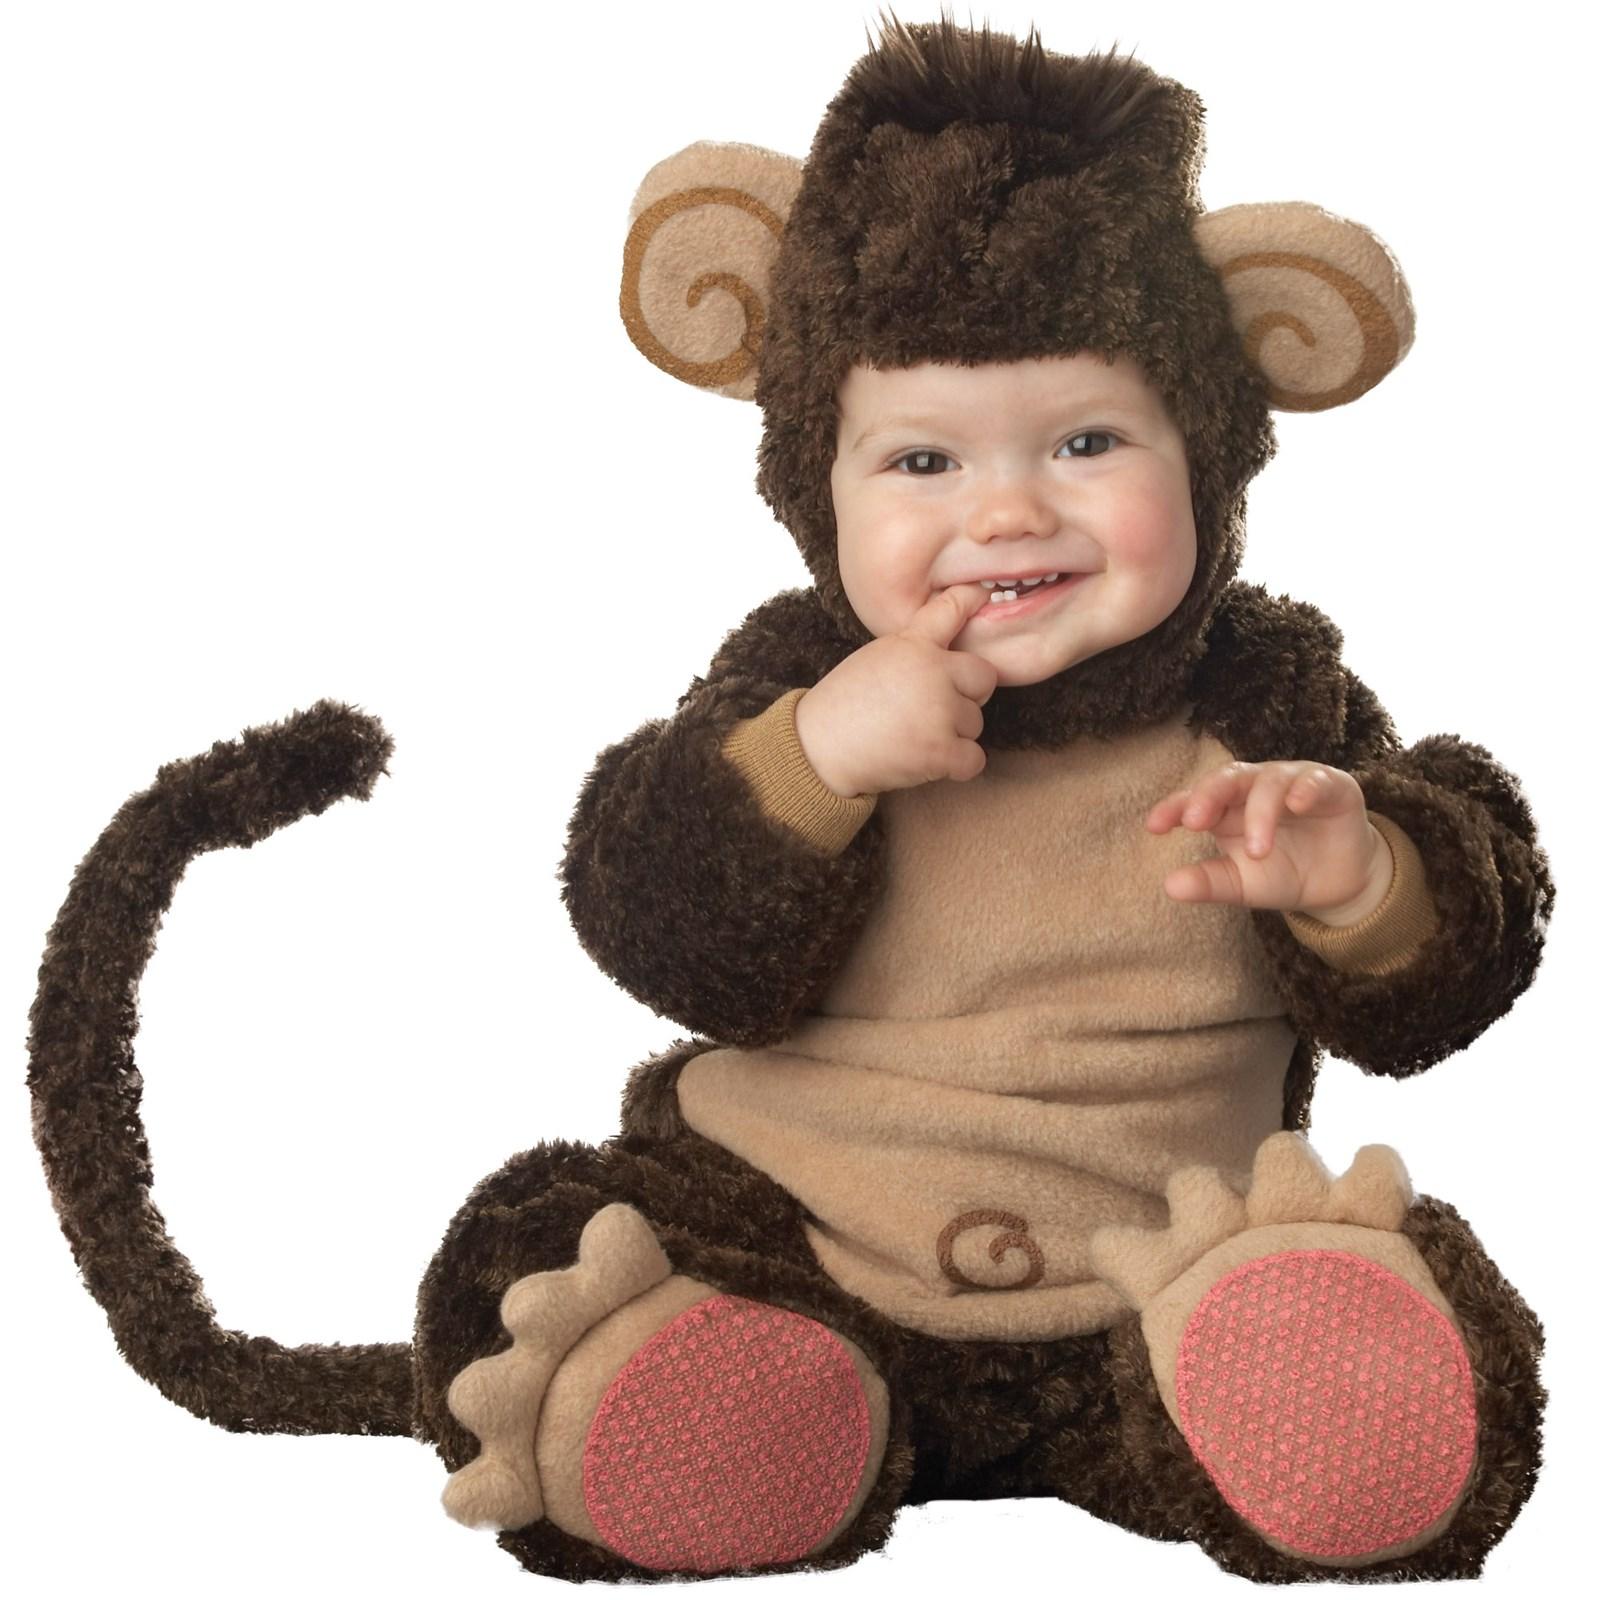 Lil' Monkey Elite Collection Infant / Toddler Costume ...